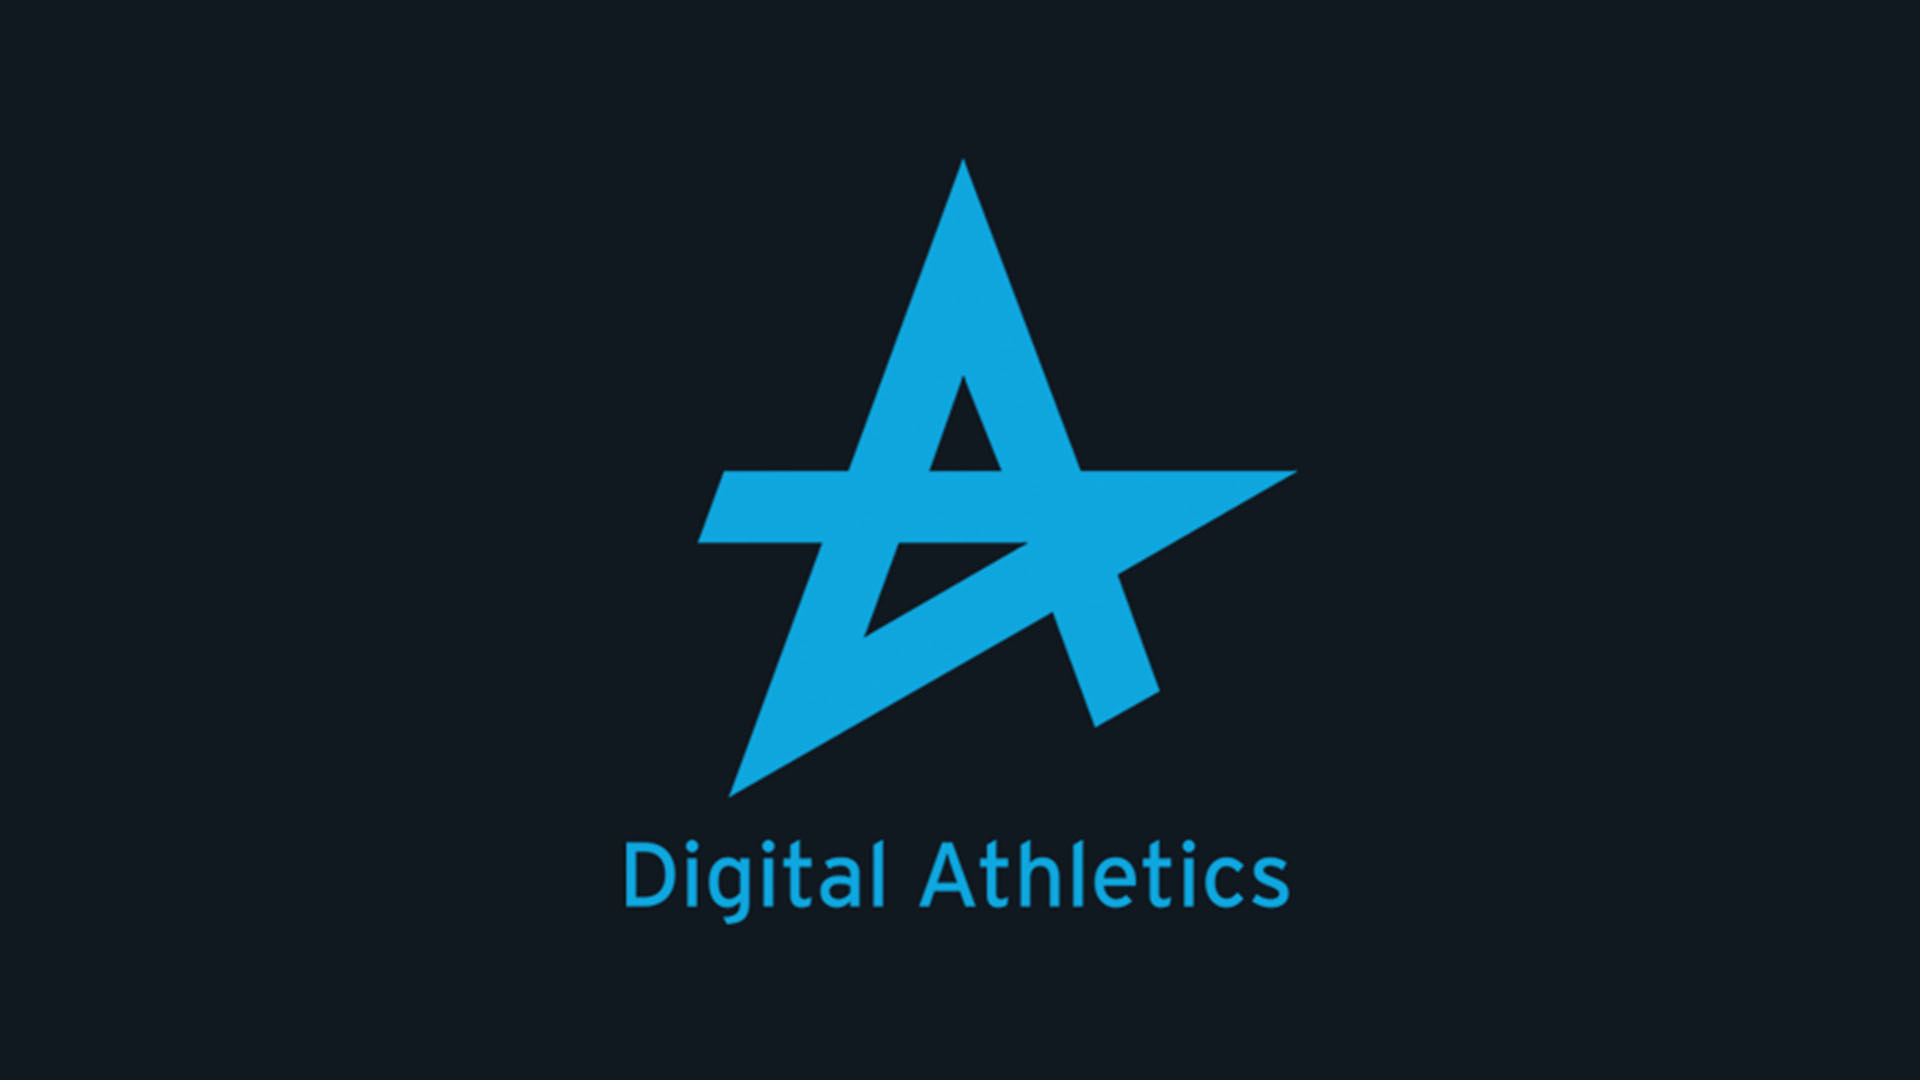 Digital Athletics